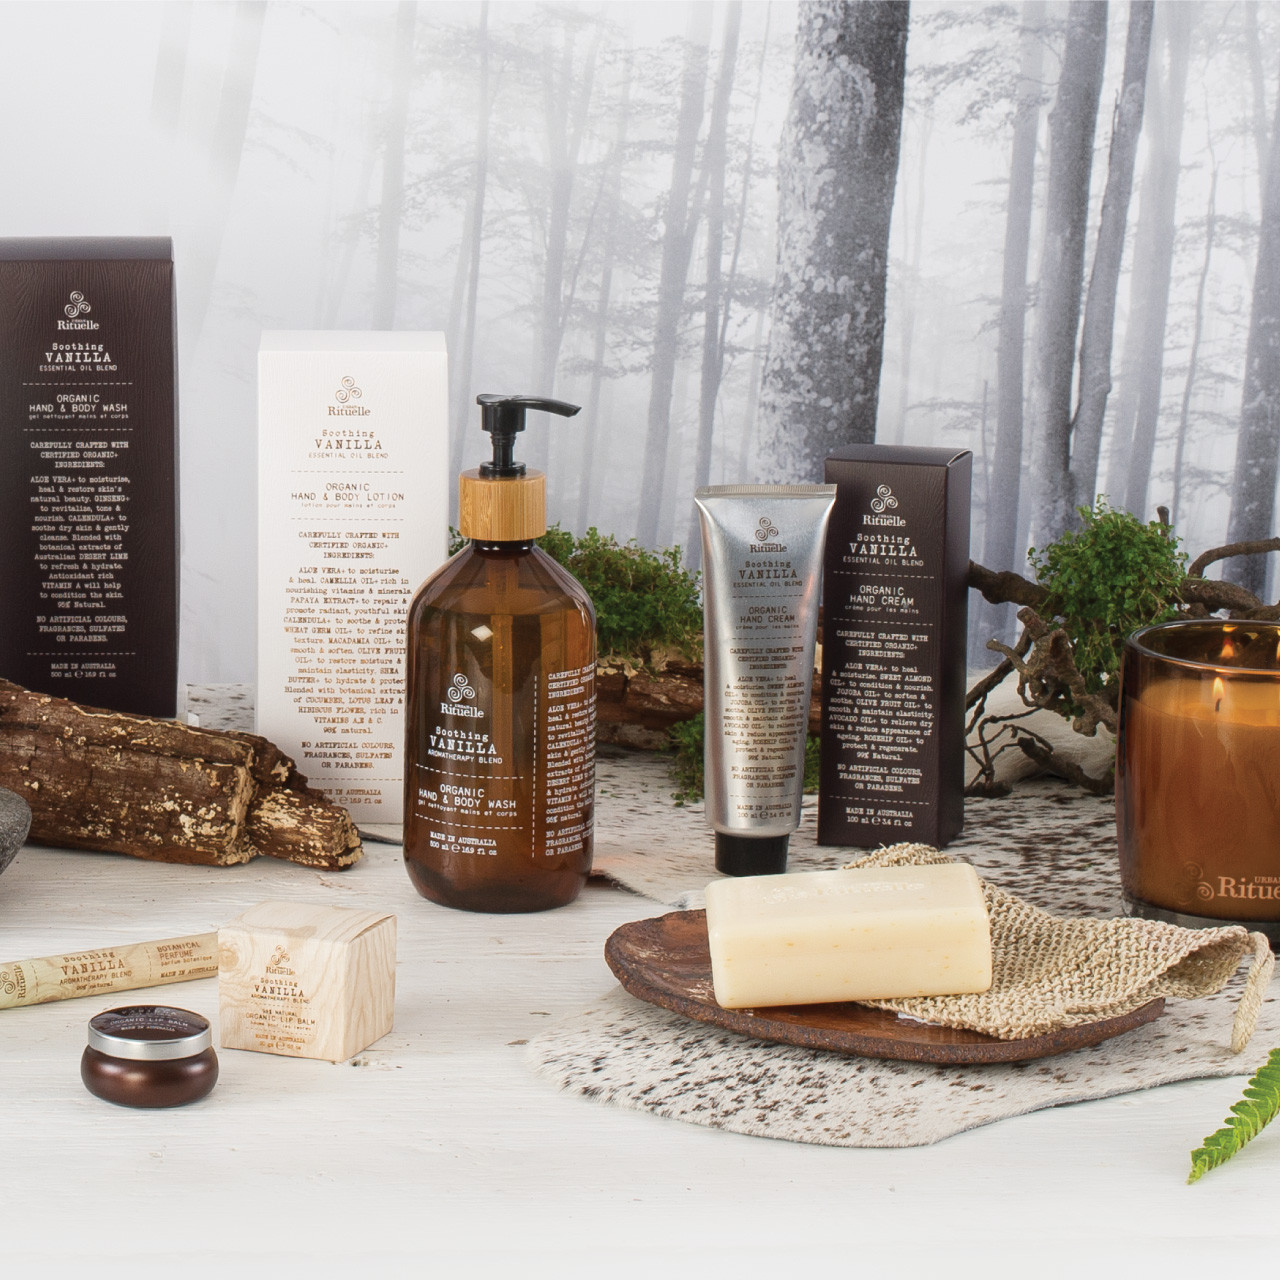 Flourish Organics - Scented Soy Candle - Vanilla  - Urban Rituelle